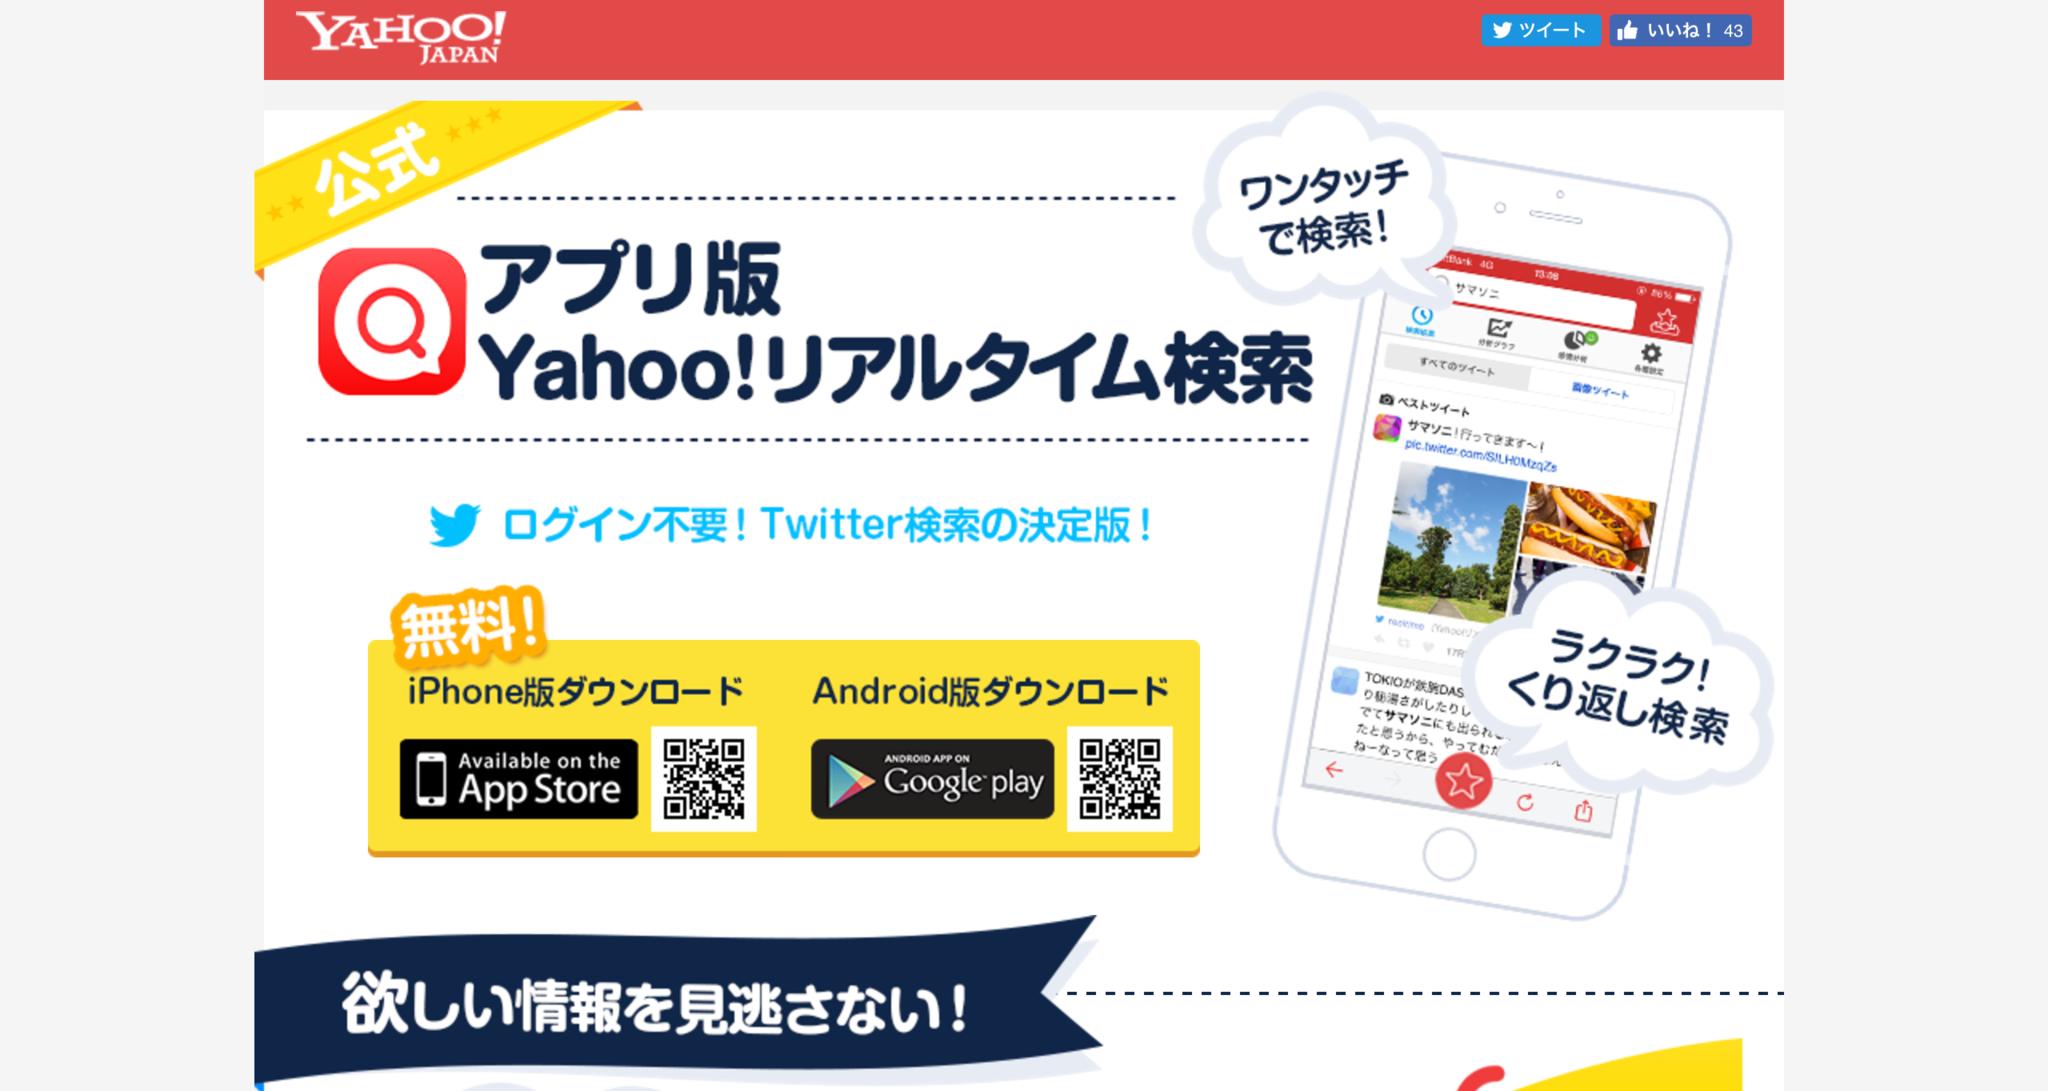 Twitter検索の決定版!Yahoo_リアルタイム検索公式アプリ_話題なう___Yahoo__JAPAN.png